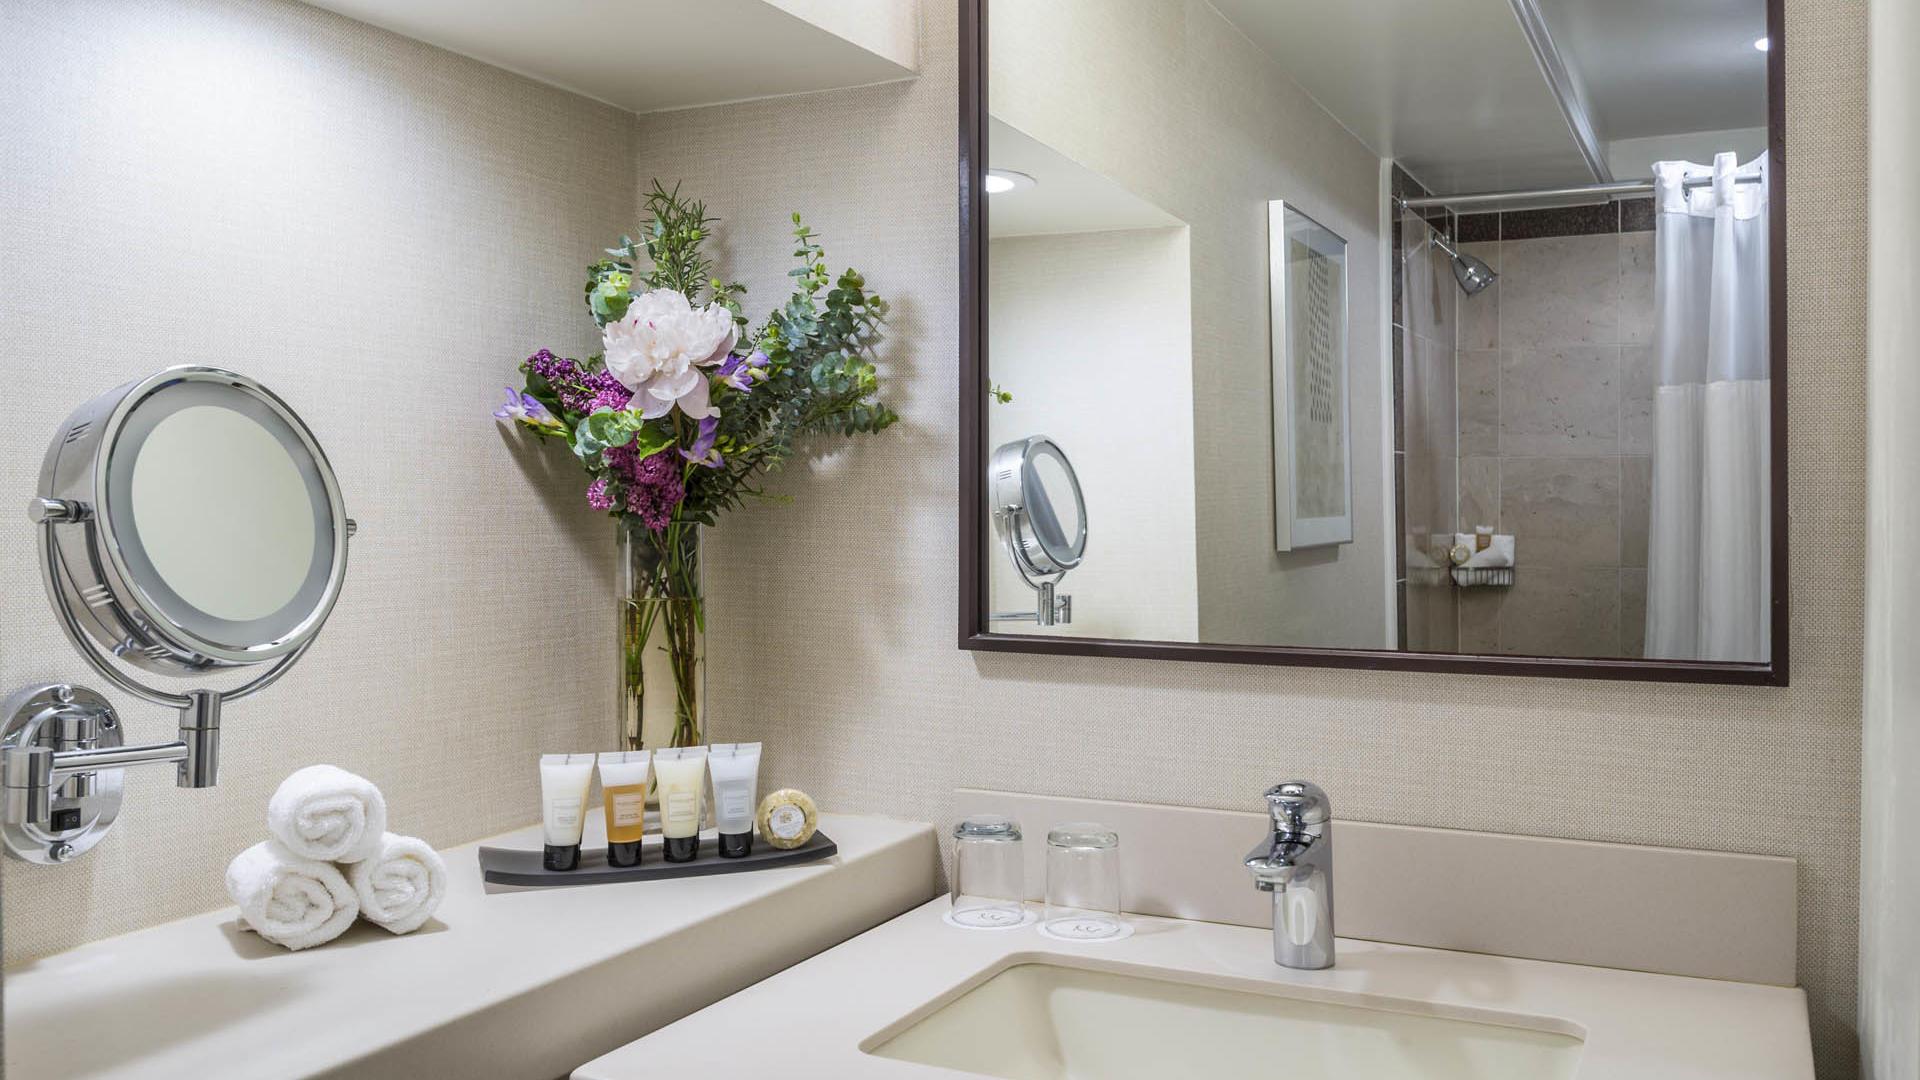 Premiere  Suite Bathroom Sink at Warwick Denver